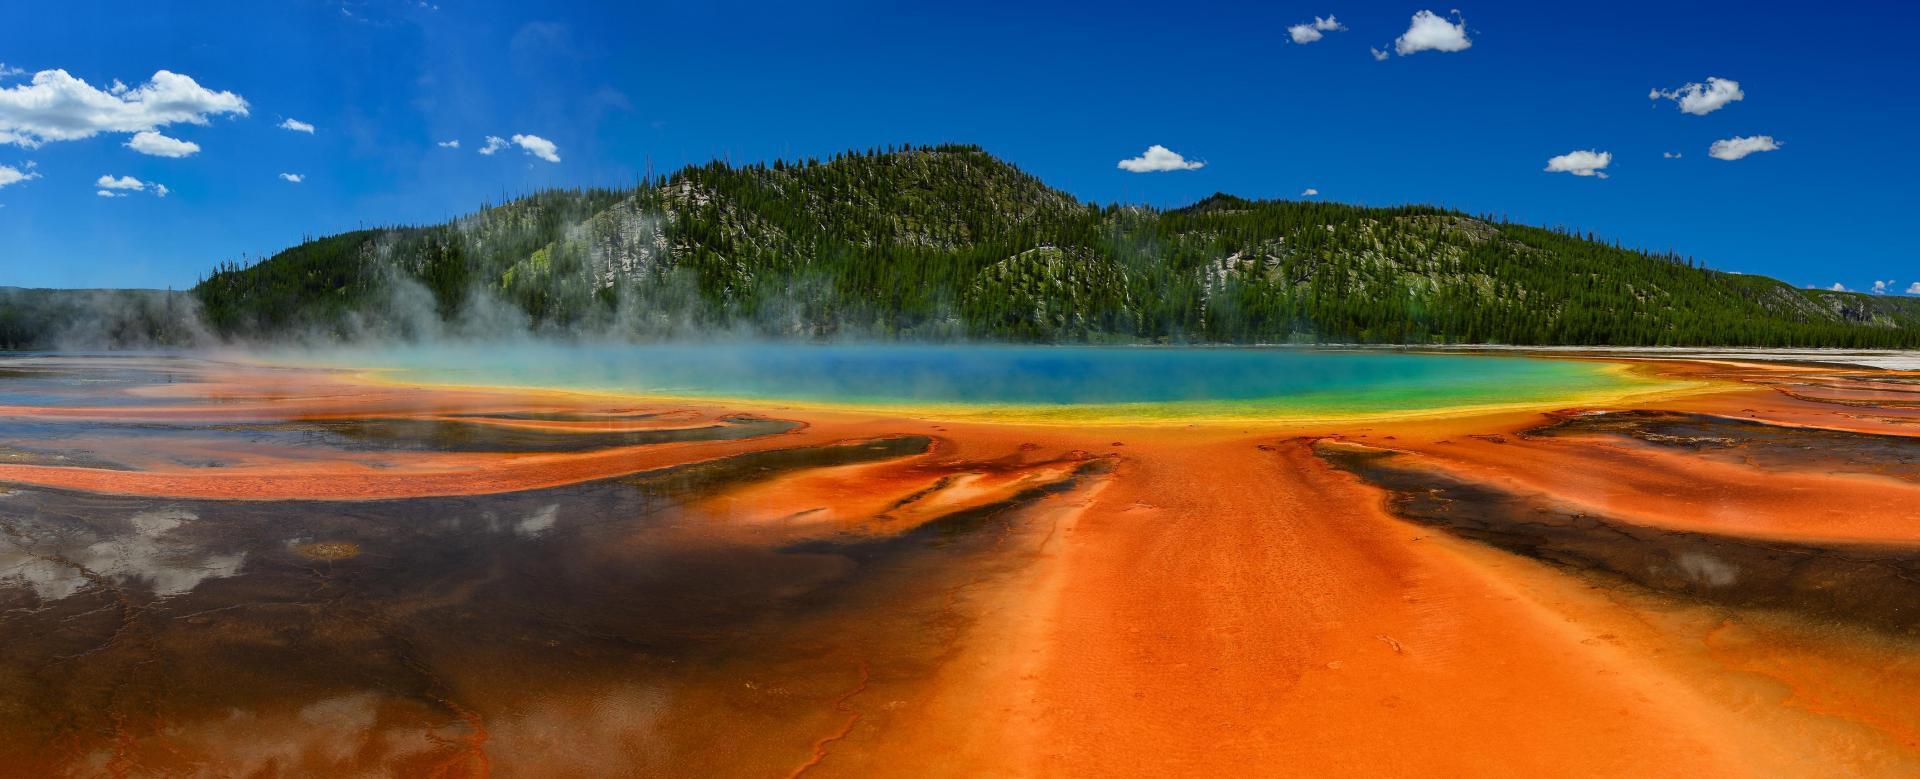 Trekking États-Unis : Du yellowstone au grand canyon (confort)